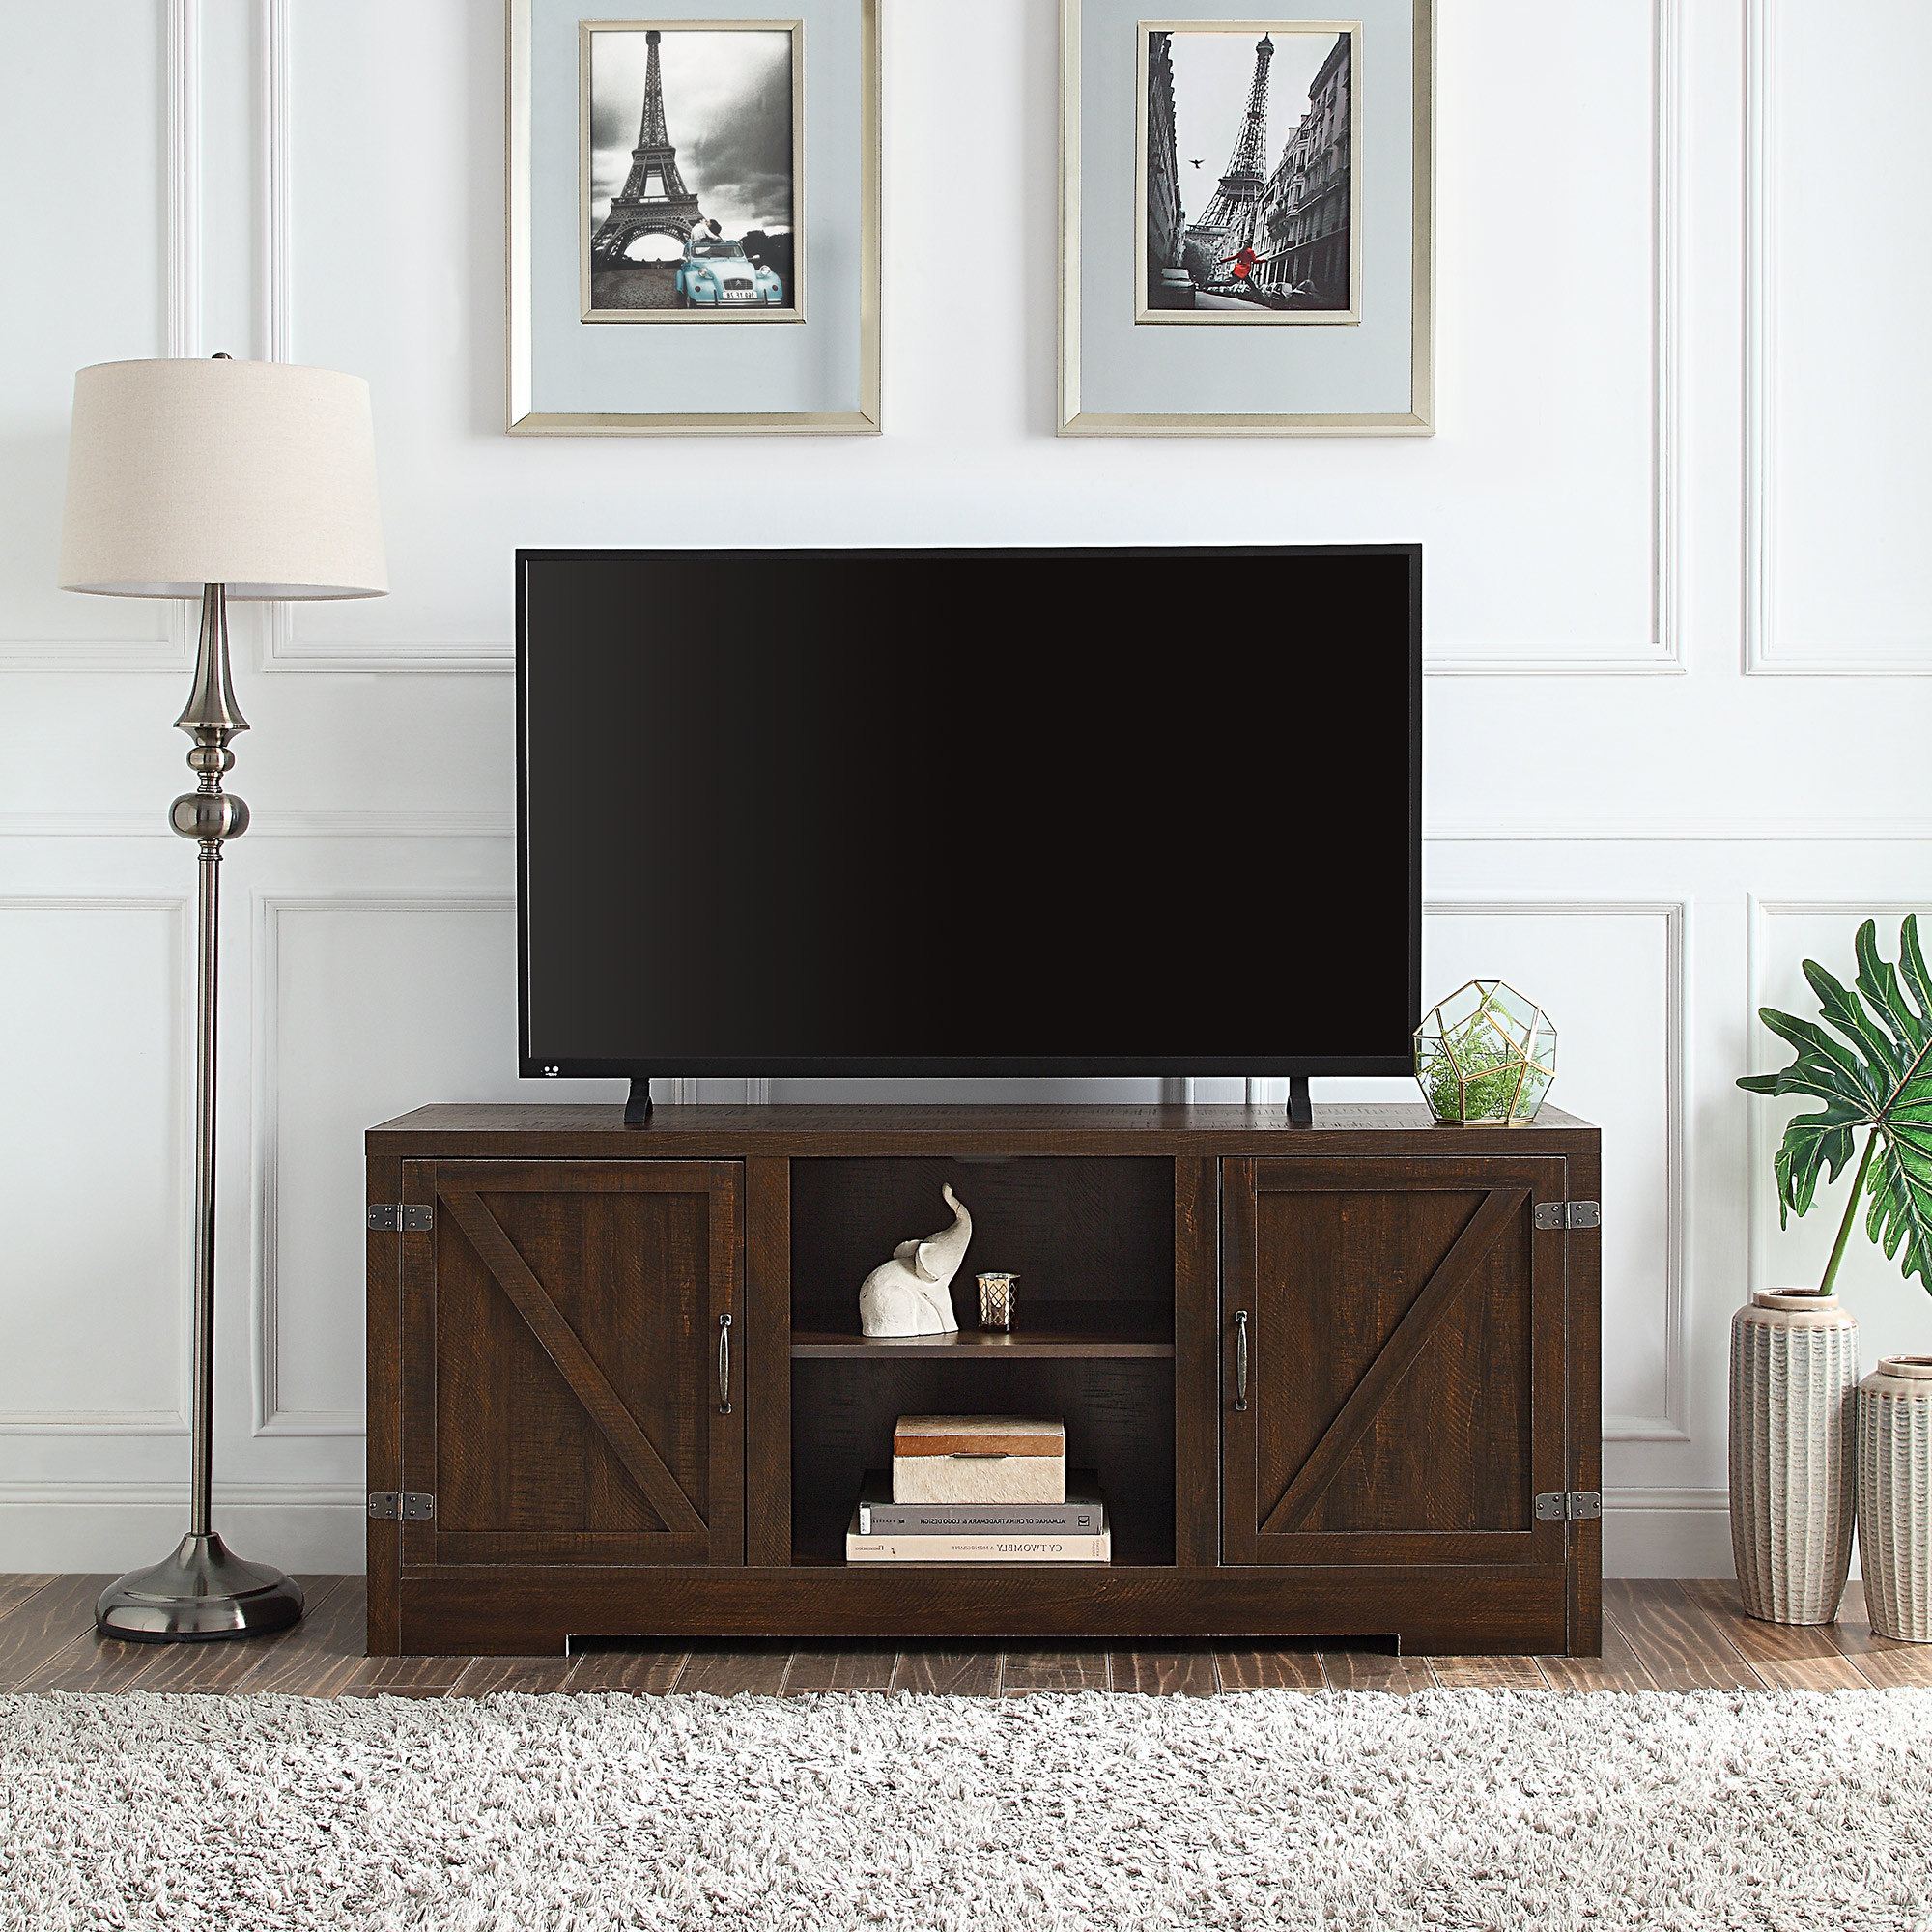 "2018 Belleze Hilo 58 Inch Barn Door Tv Stand Console For Tvs Up Regarding Kamari Tv Stands For Tvs Up To 58"" (View 10 of 25)"